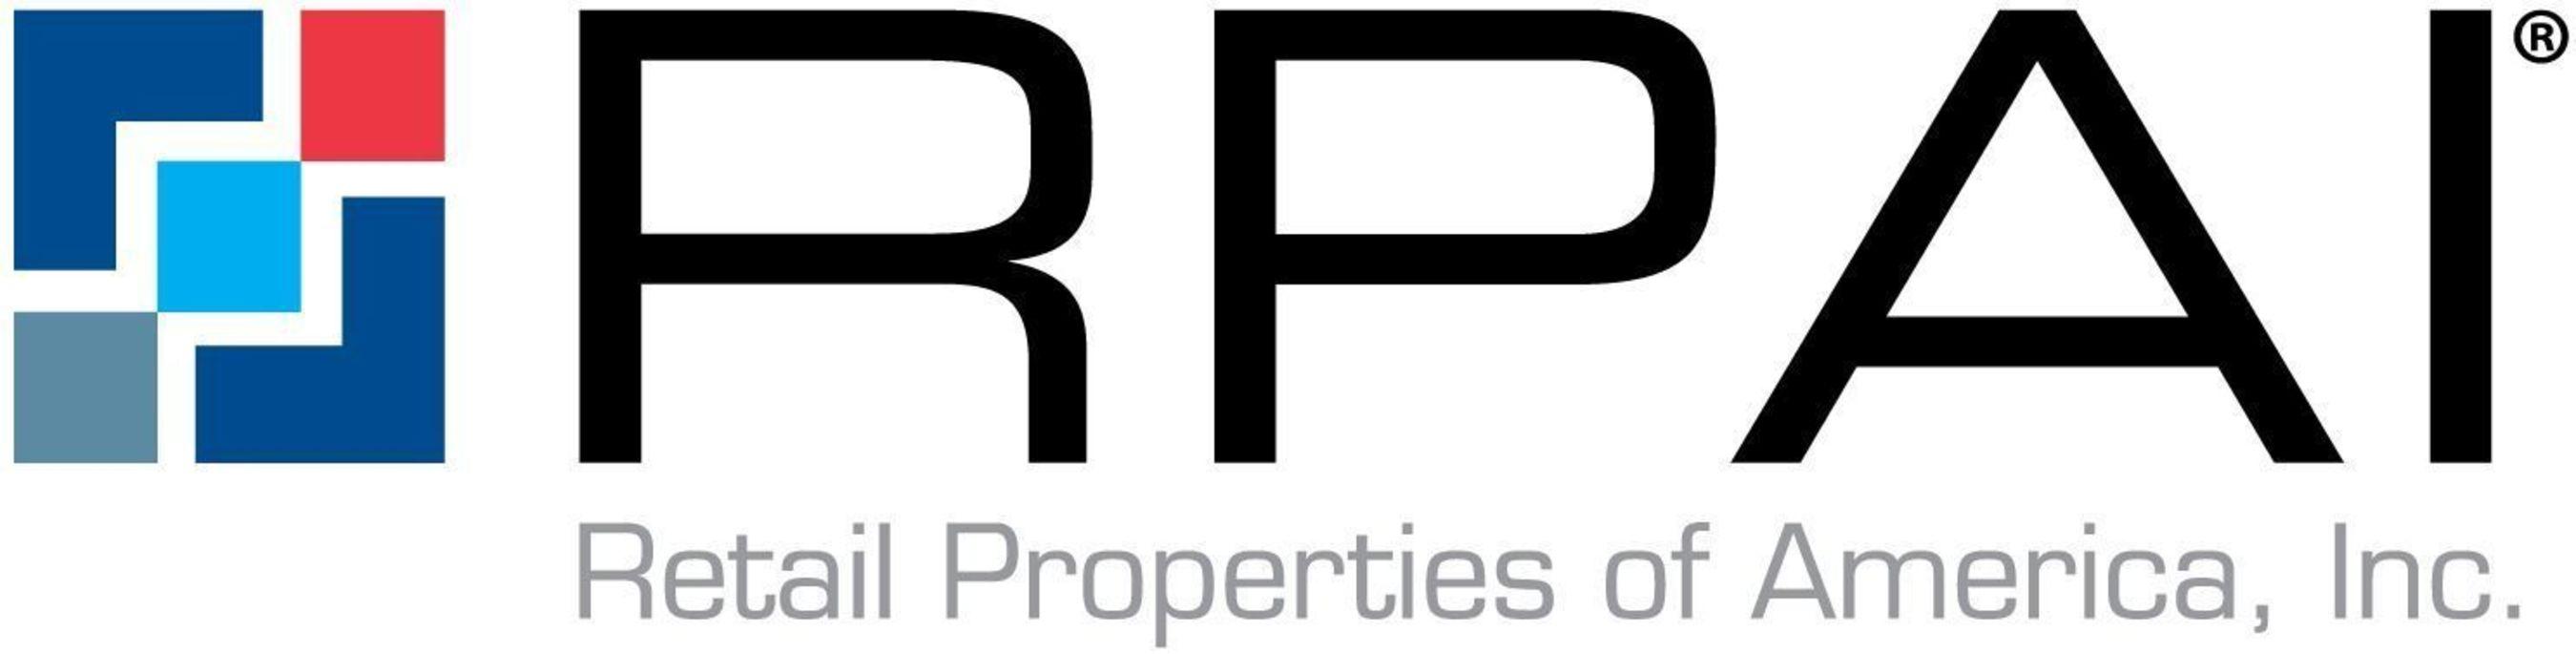 Retail Properties of America Inc